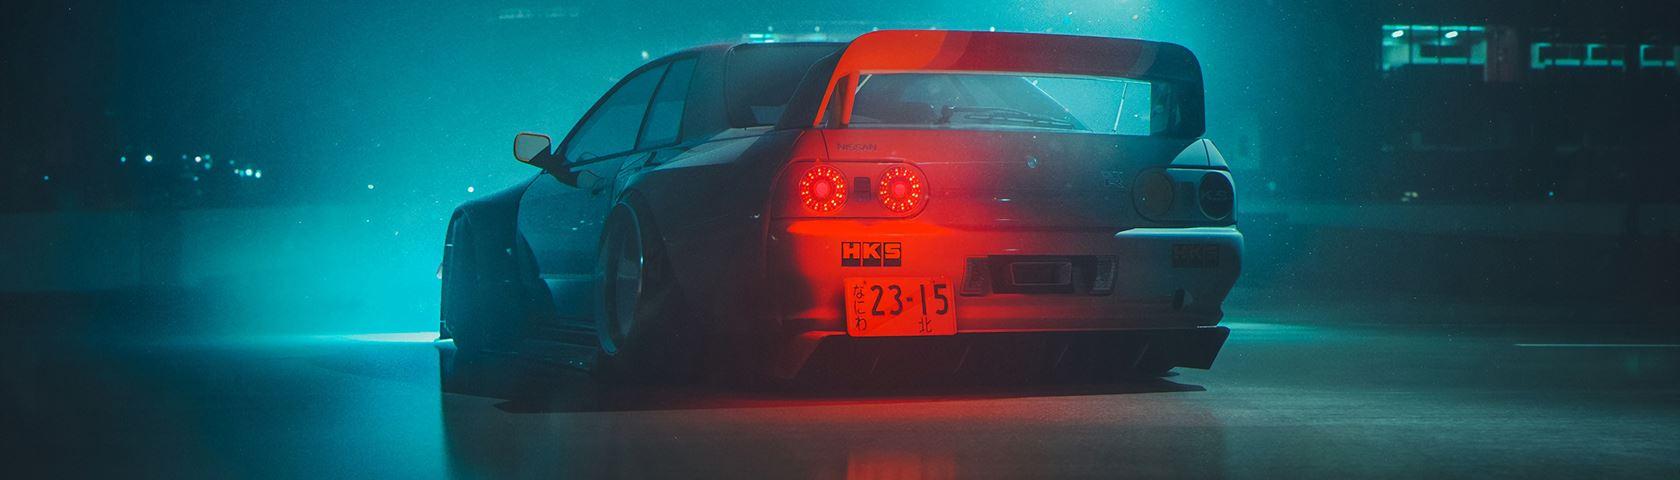 Skyline R34 Turbo